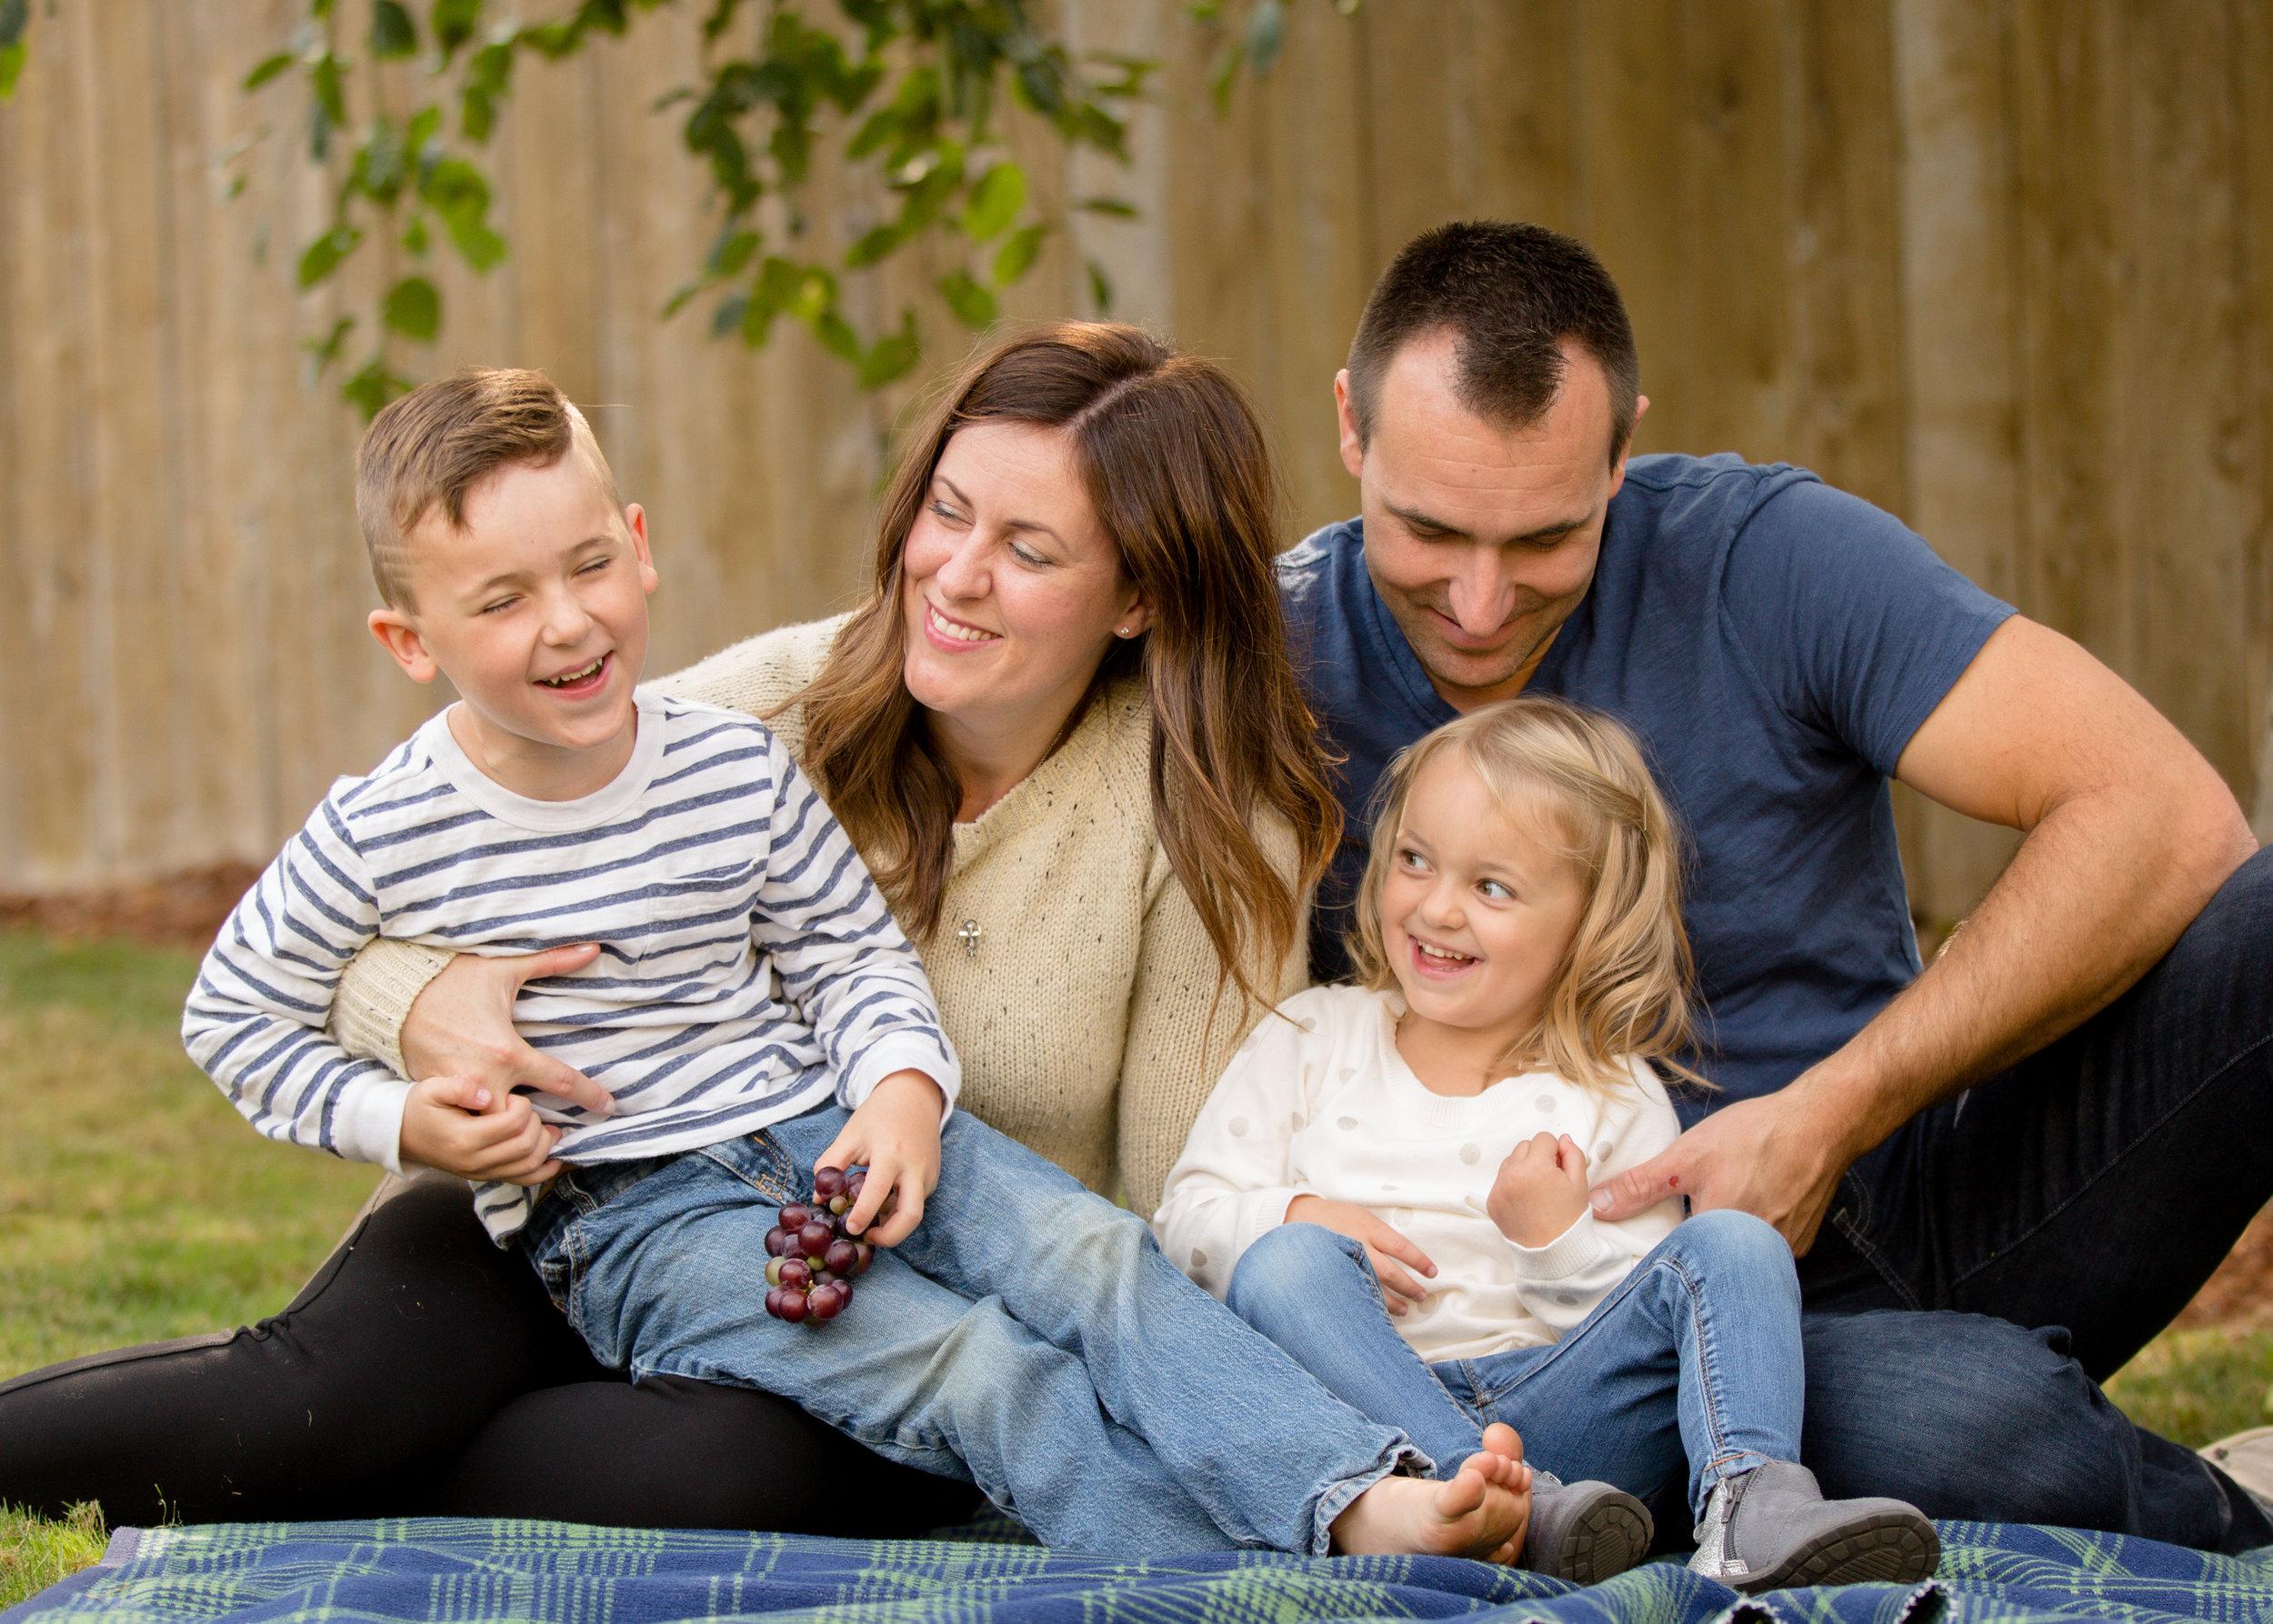 Snohomish County Family Photographer | Lake Stevens, WA